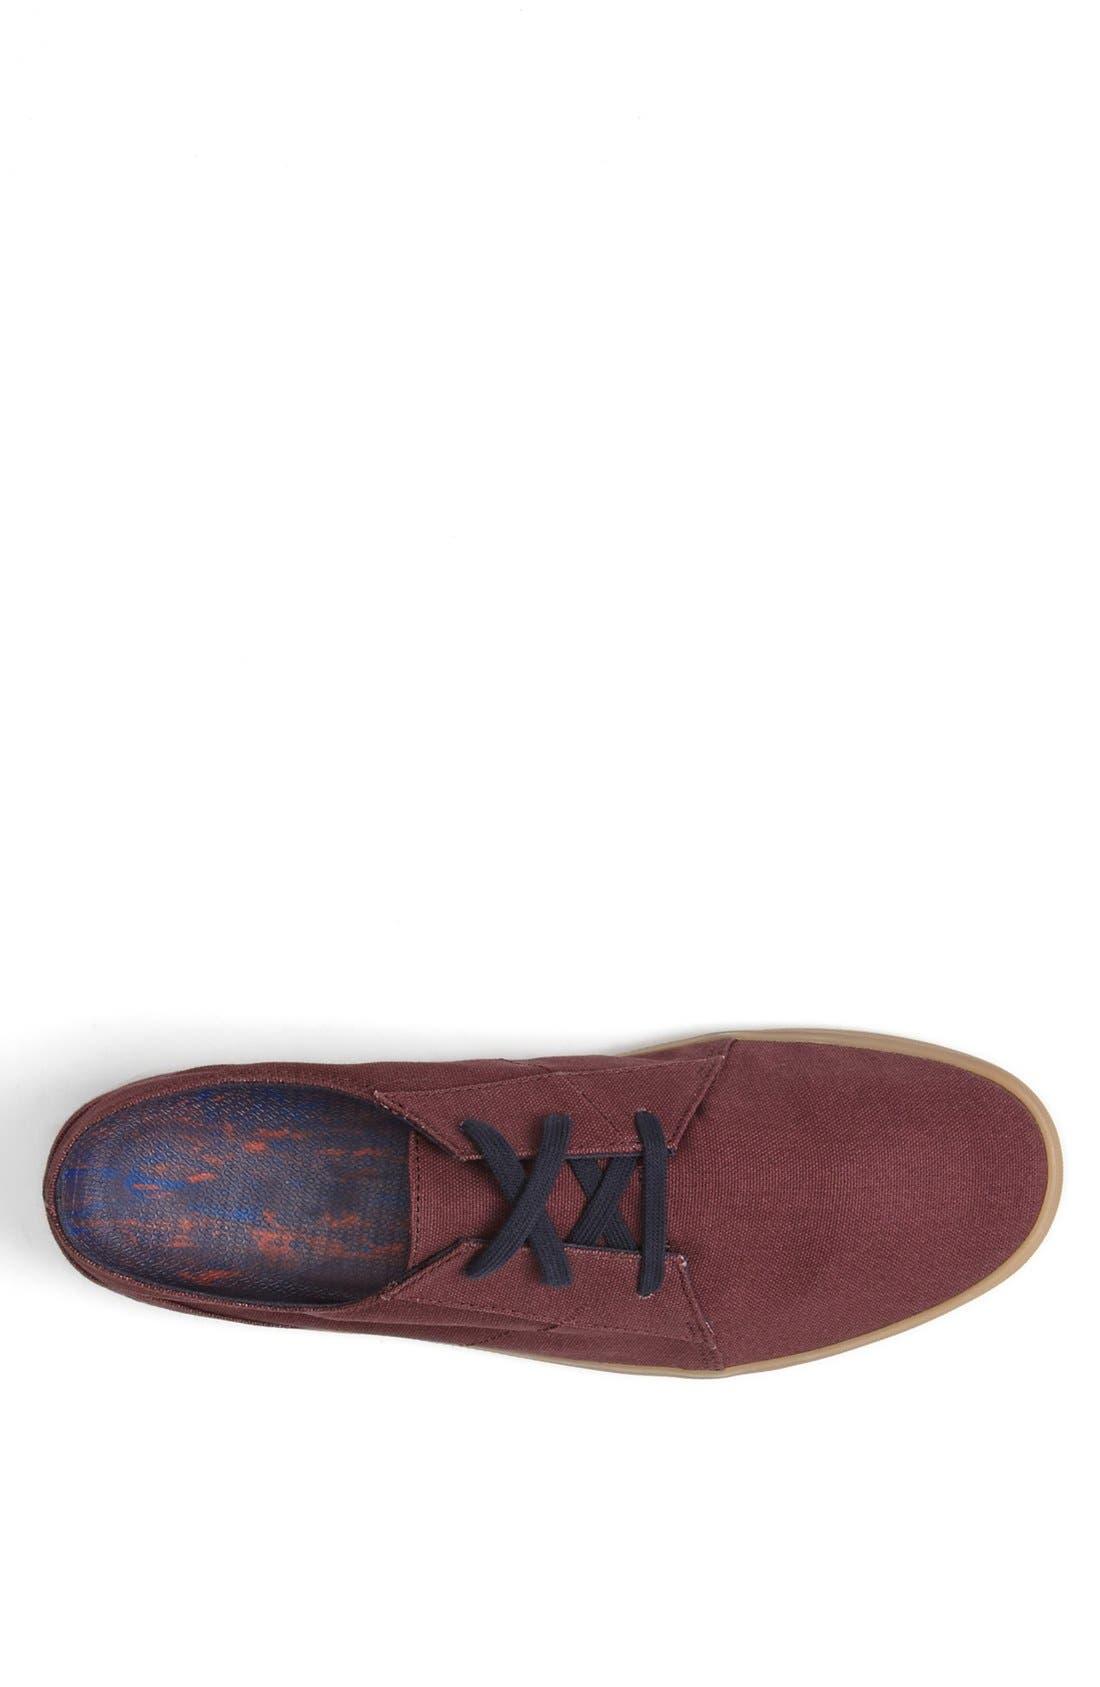 Alternate Image 3  - Volcom 'Lo Fi' Sneaker